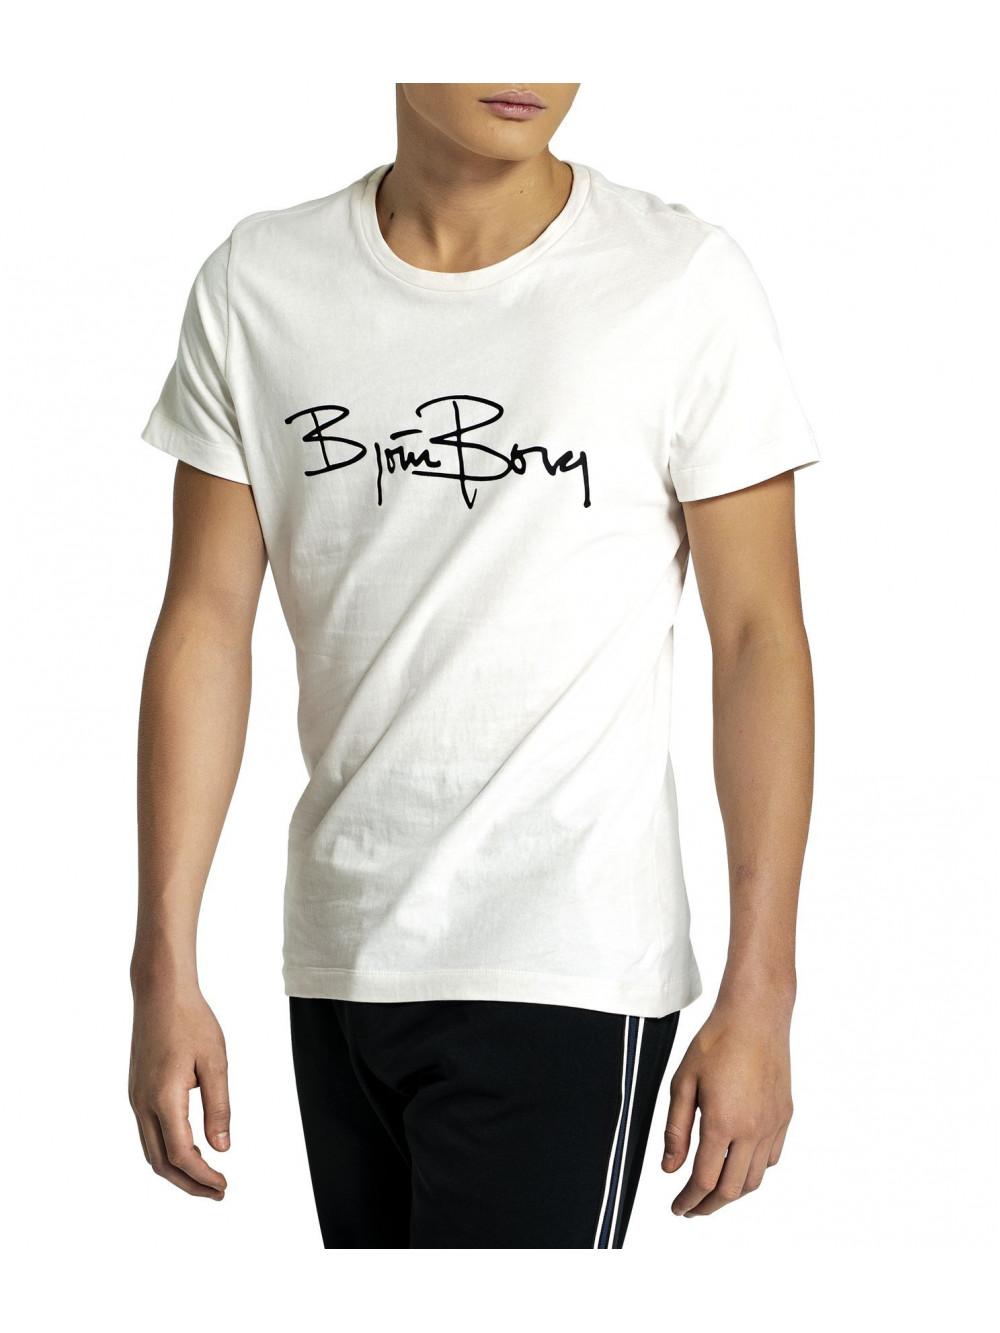 Tričko Björn Borg Signature Logo Tee Jet Stream biele